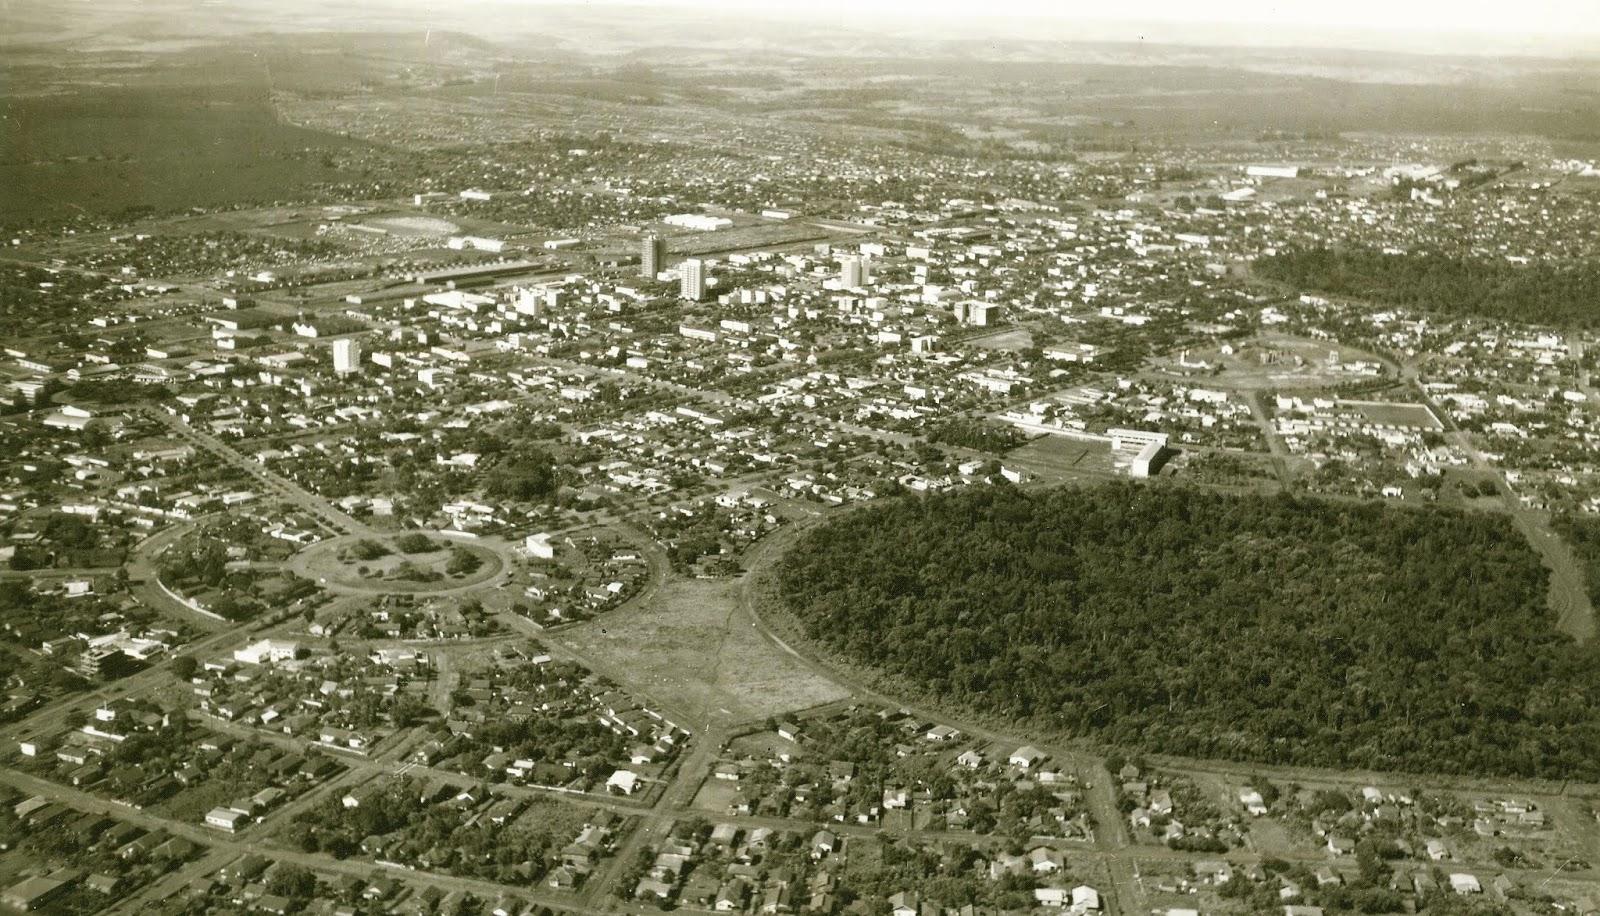 Vista aérea de Maringá - Década de 1960